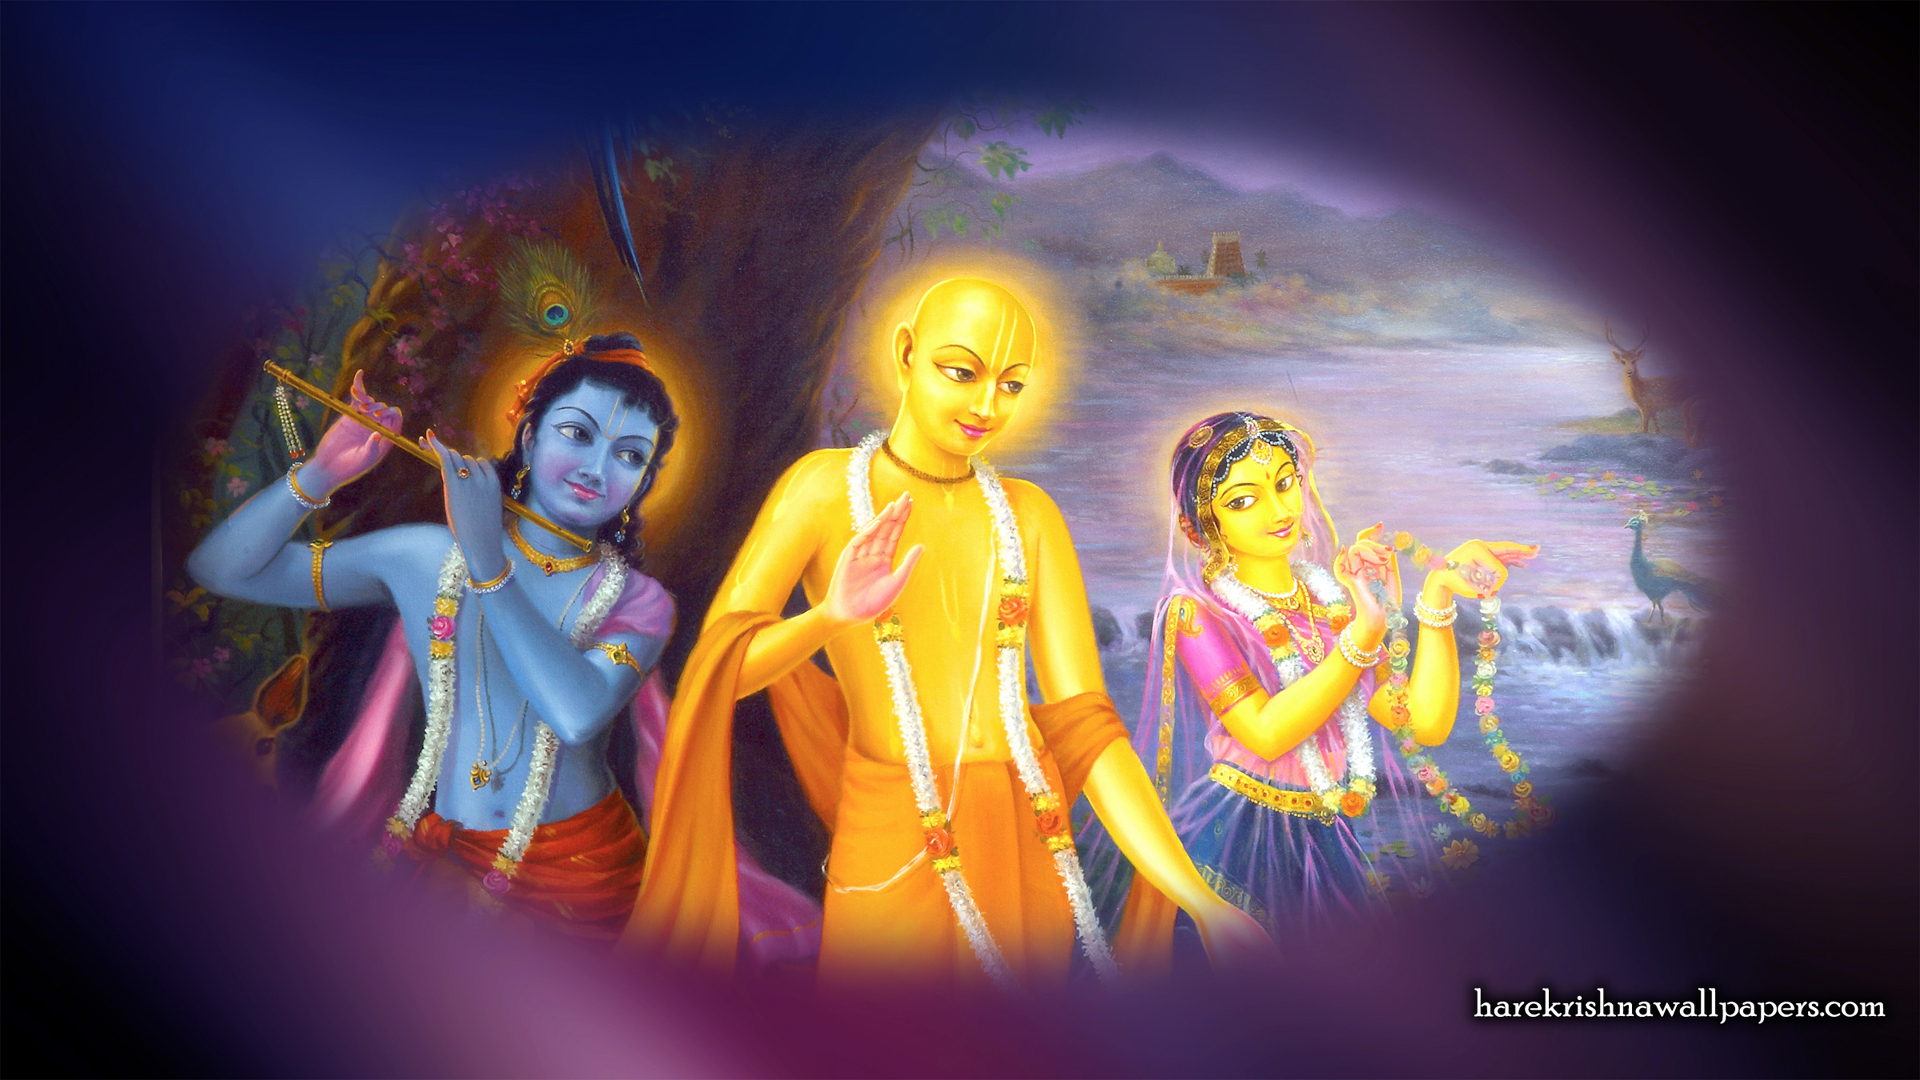 Chaitanya Mahaprabhu Wallpaper (006) Size 1920x1080 Download